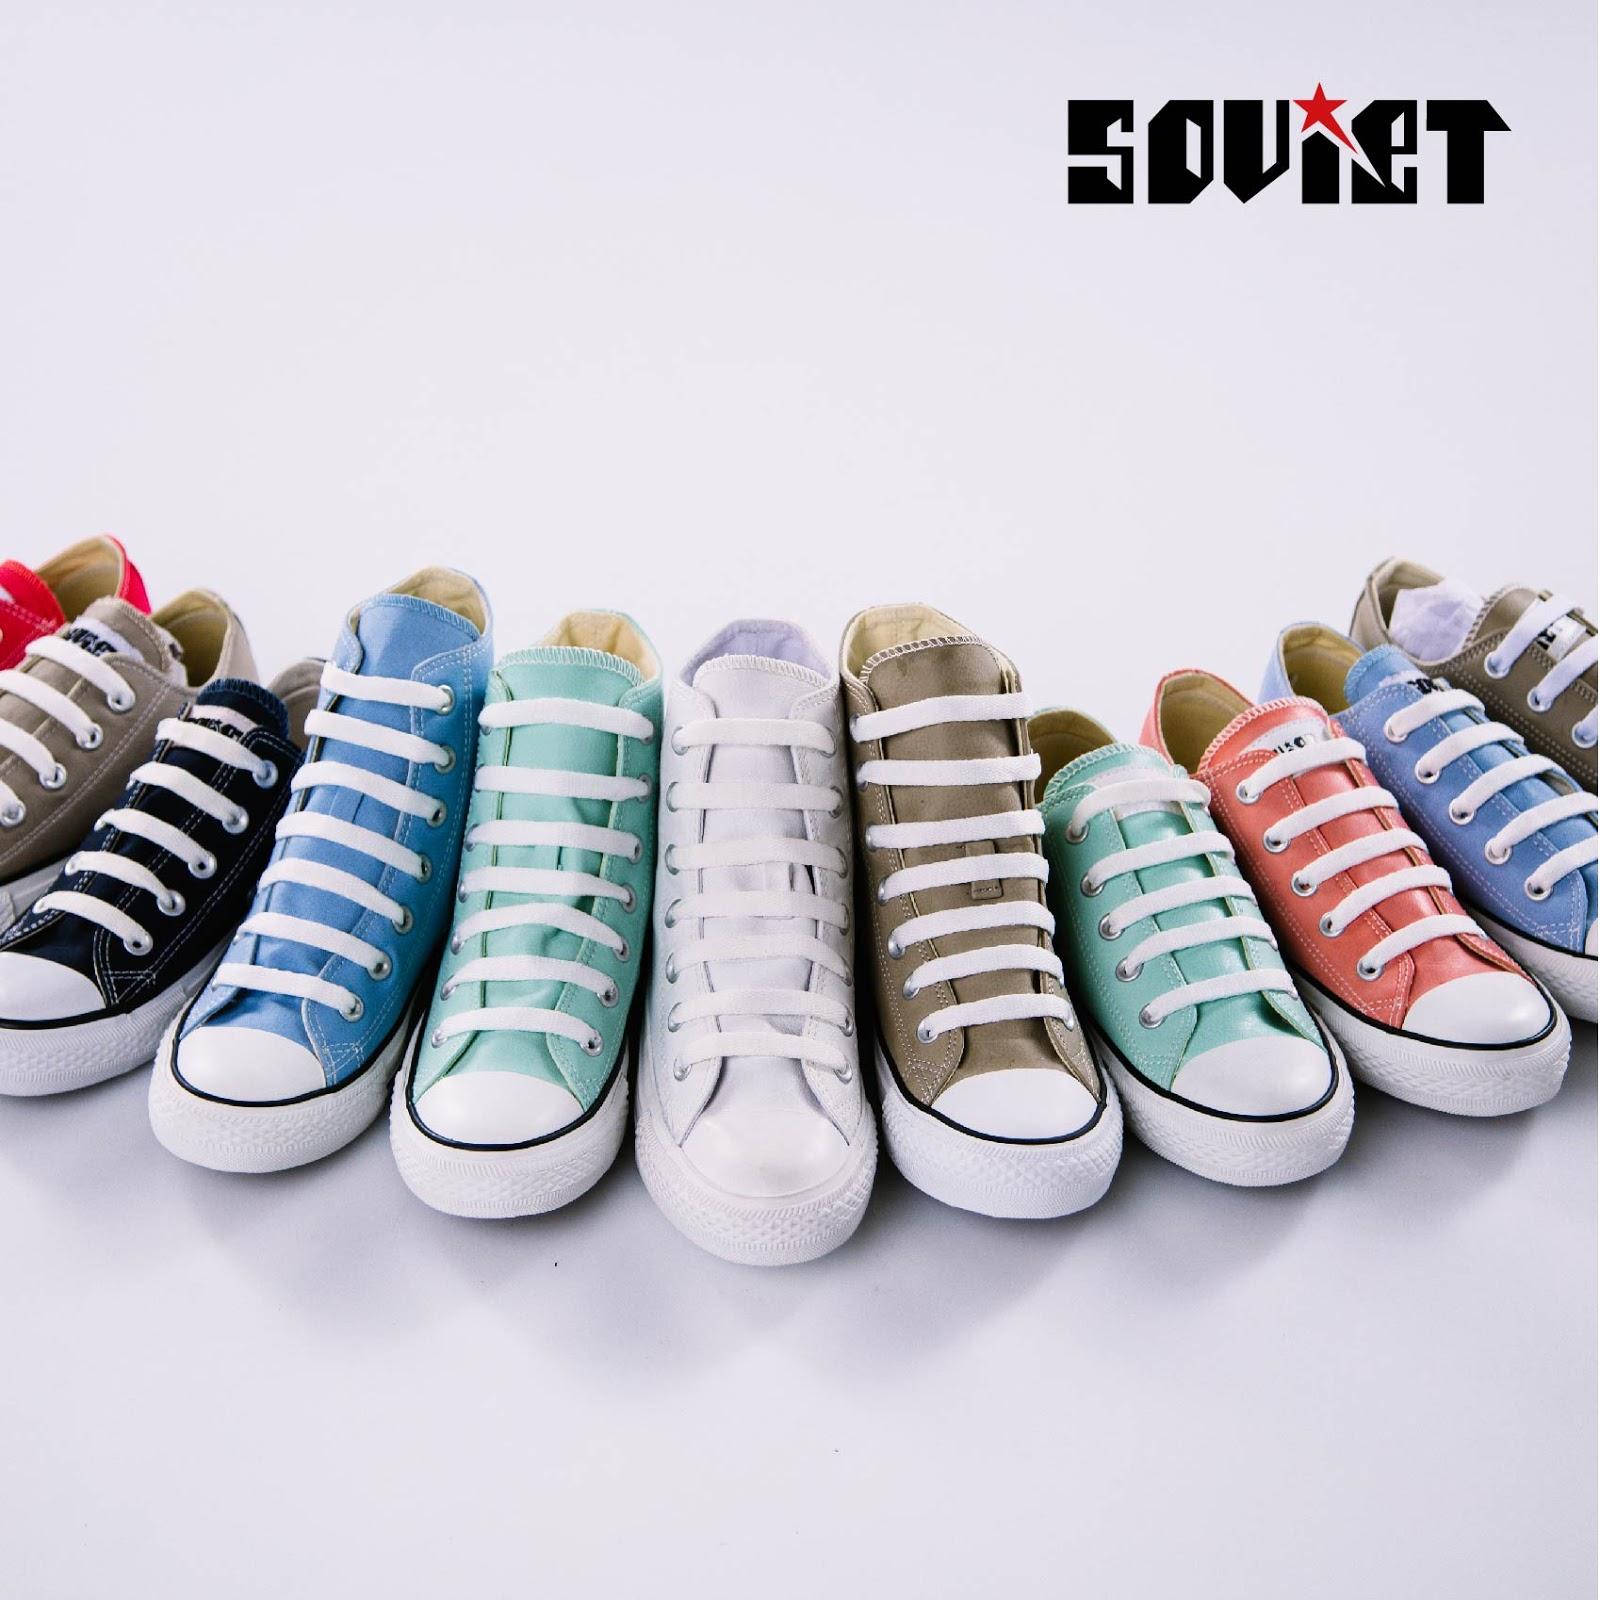 Soviet Denim  Sneakerheads in South Africa 763c766ada257